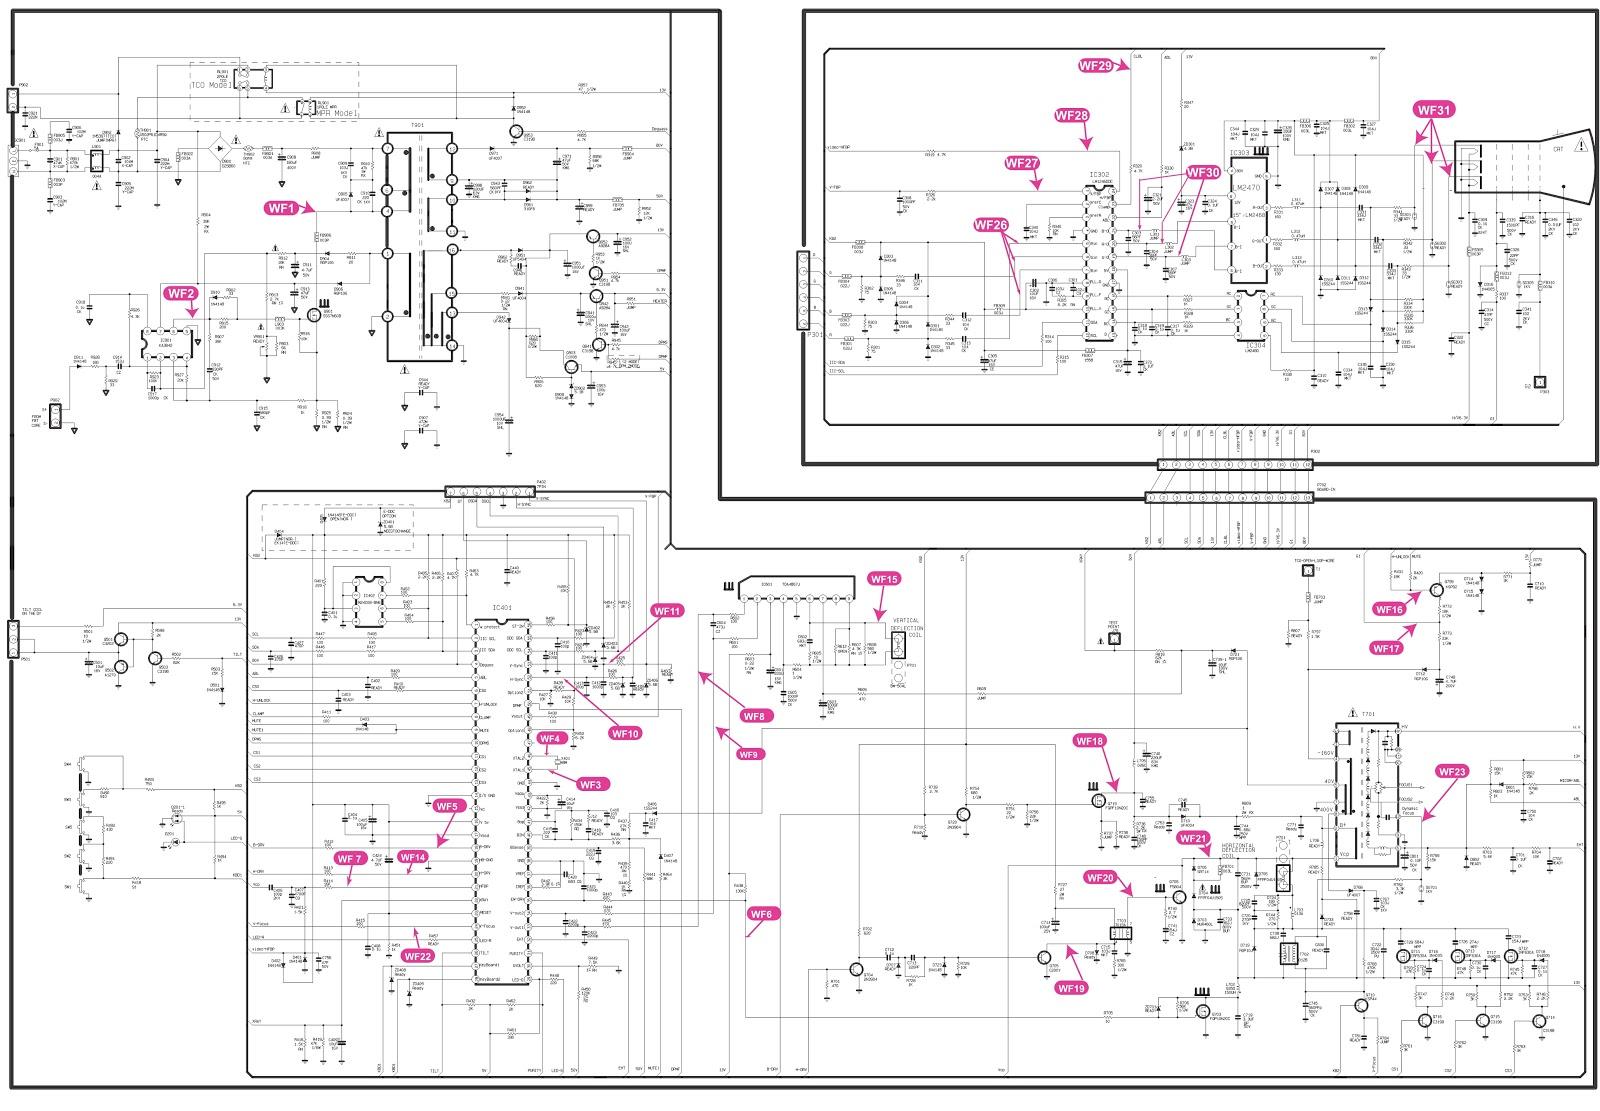 Lg Flatron C17lc 17 Inch Crt Monitor Circuit Diagram